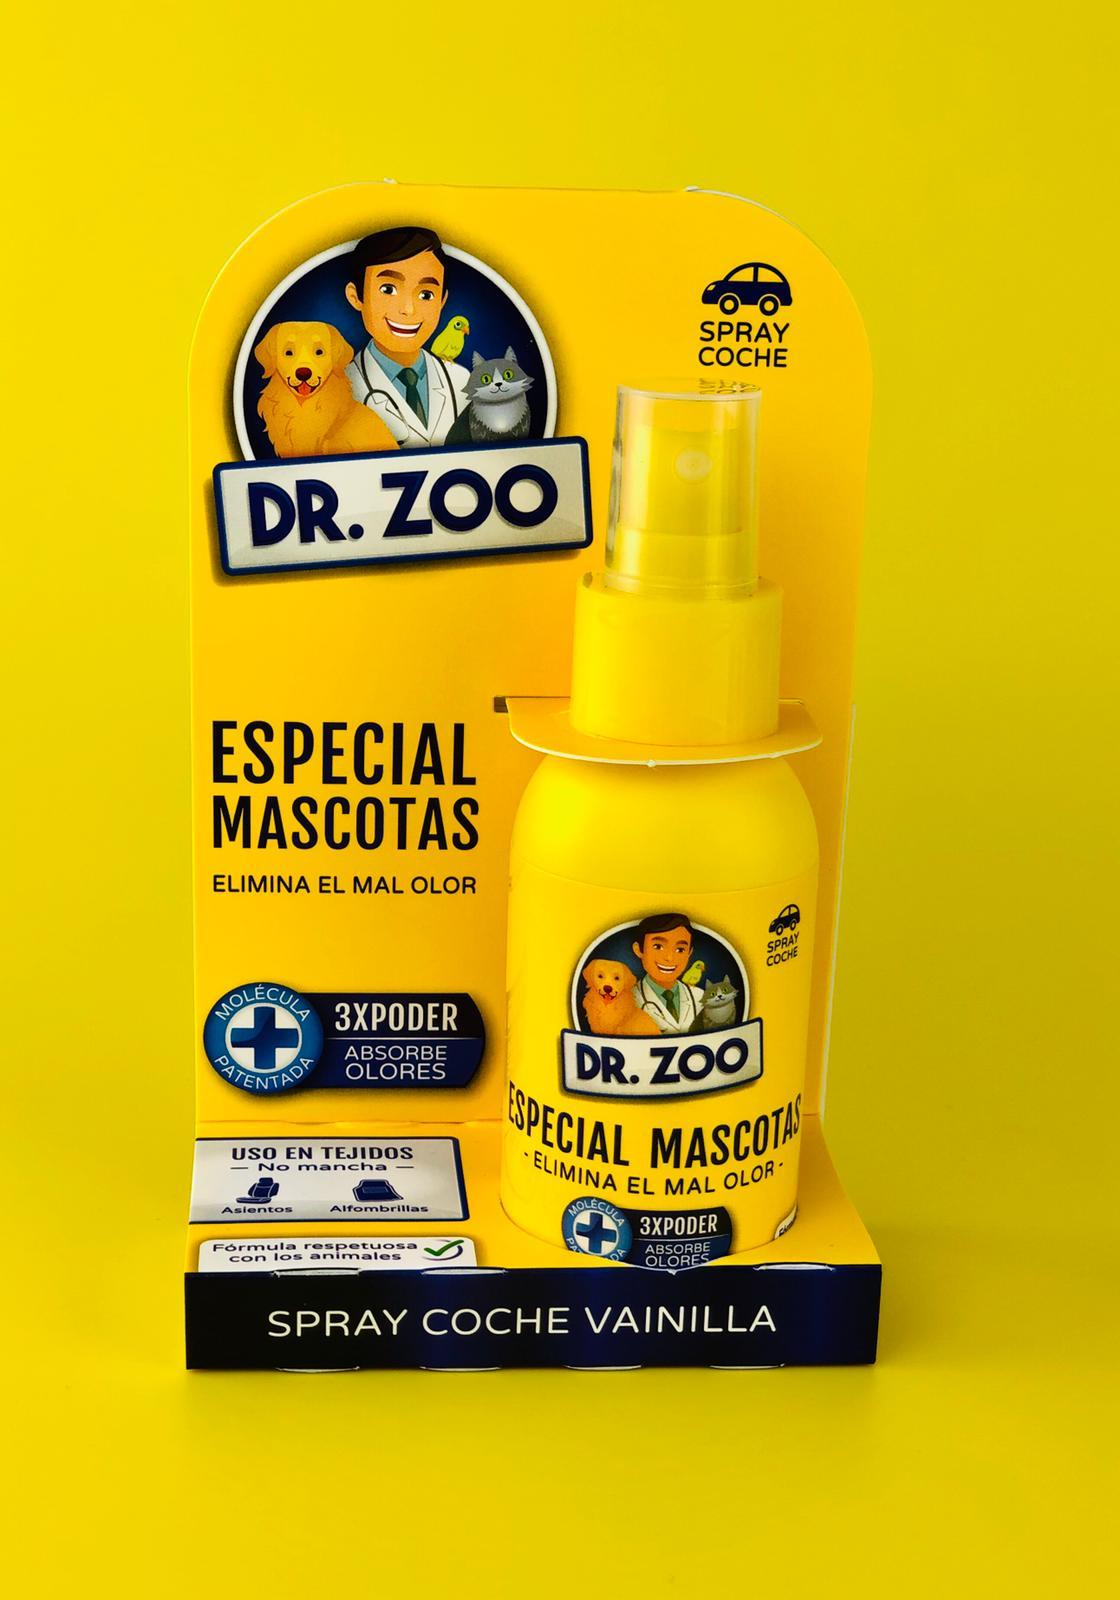 DR Zoo Spray Coche Vainilla 90ml